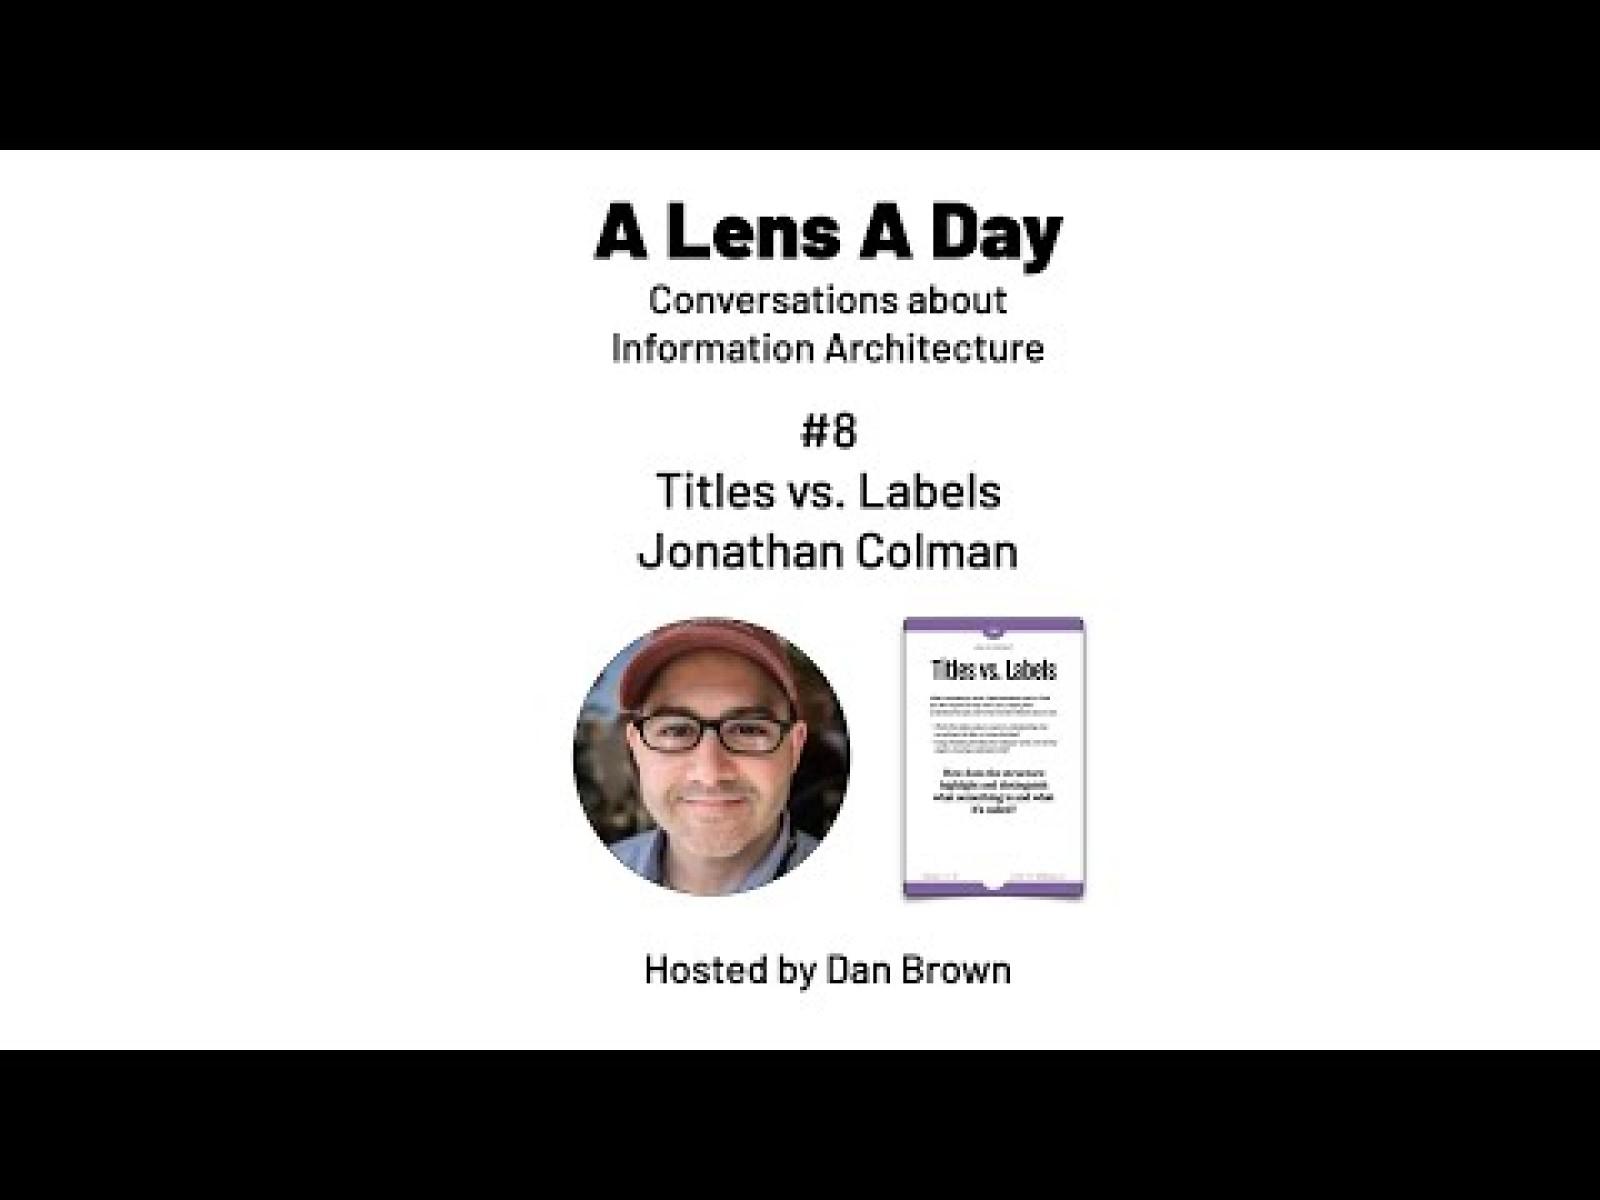 A Lens A Day #8 - Titles vs. Labels